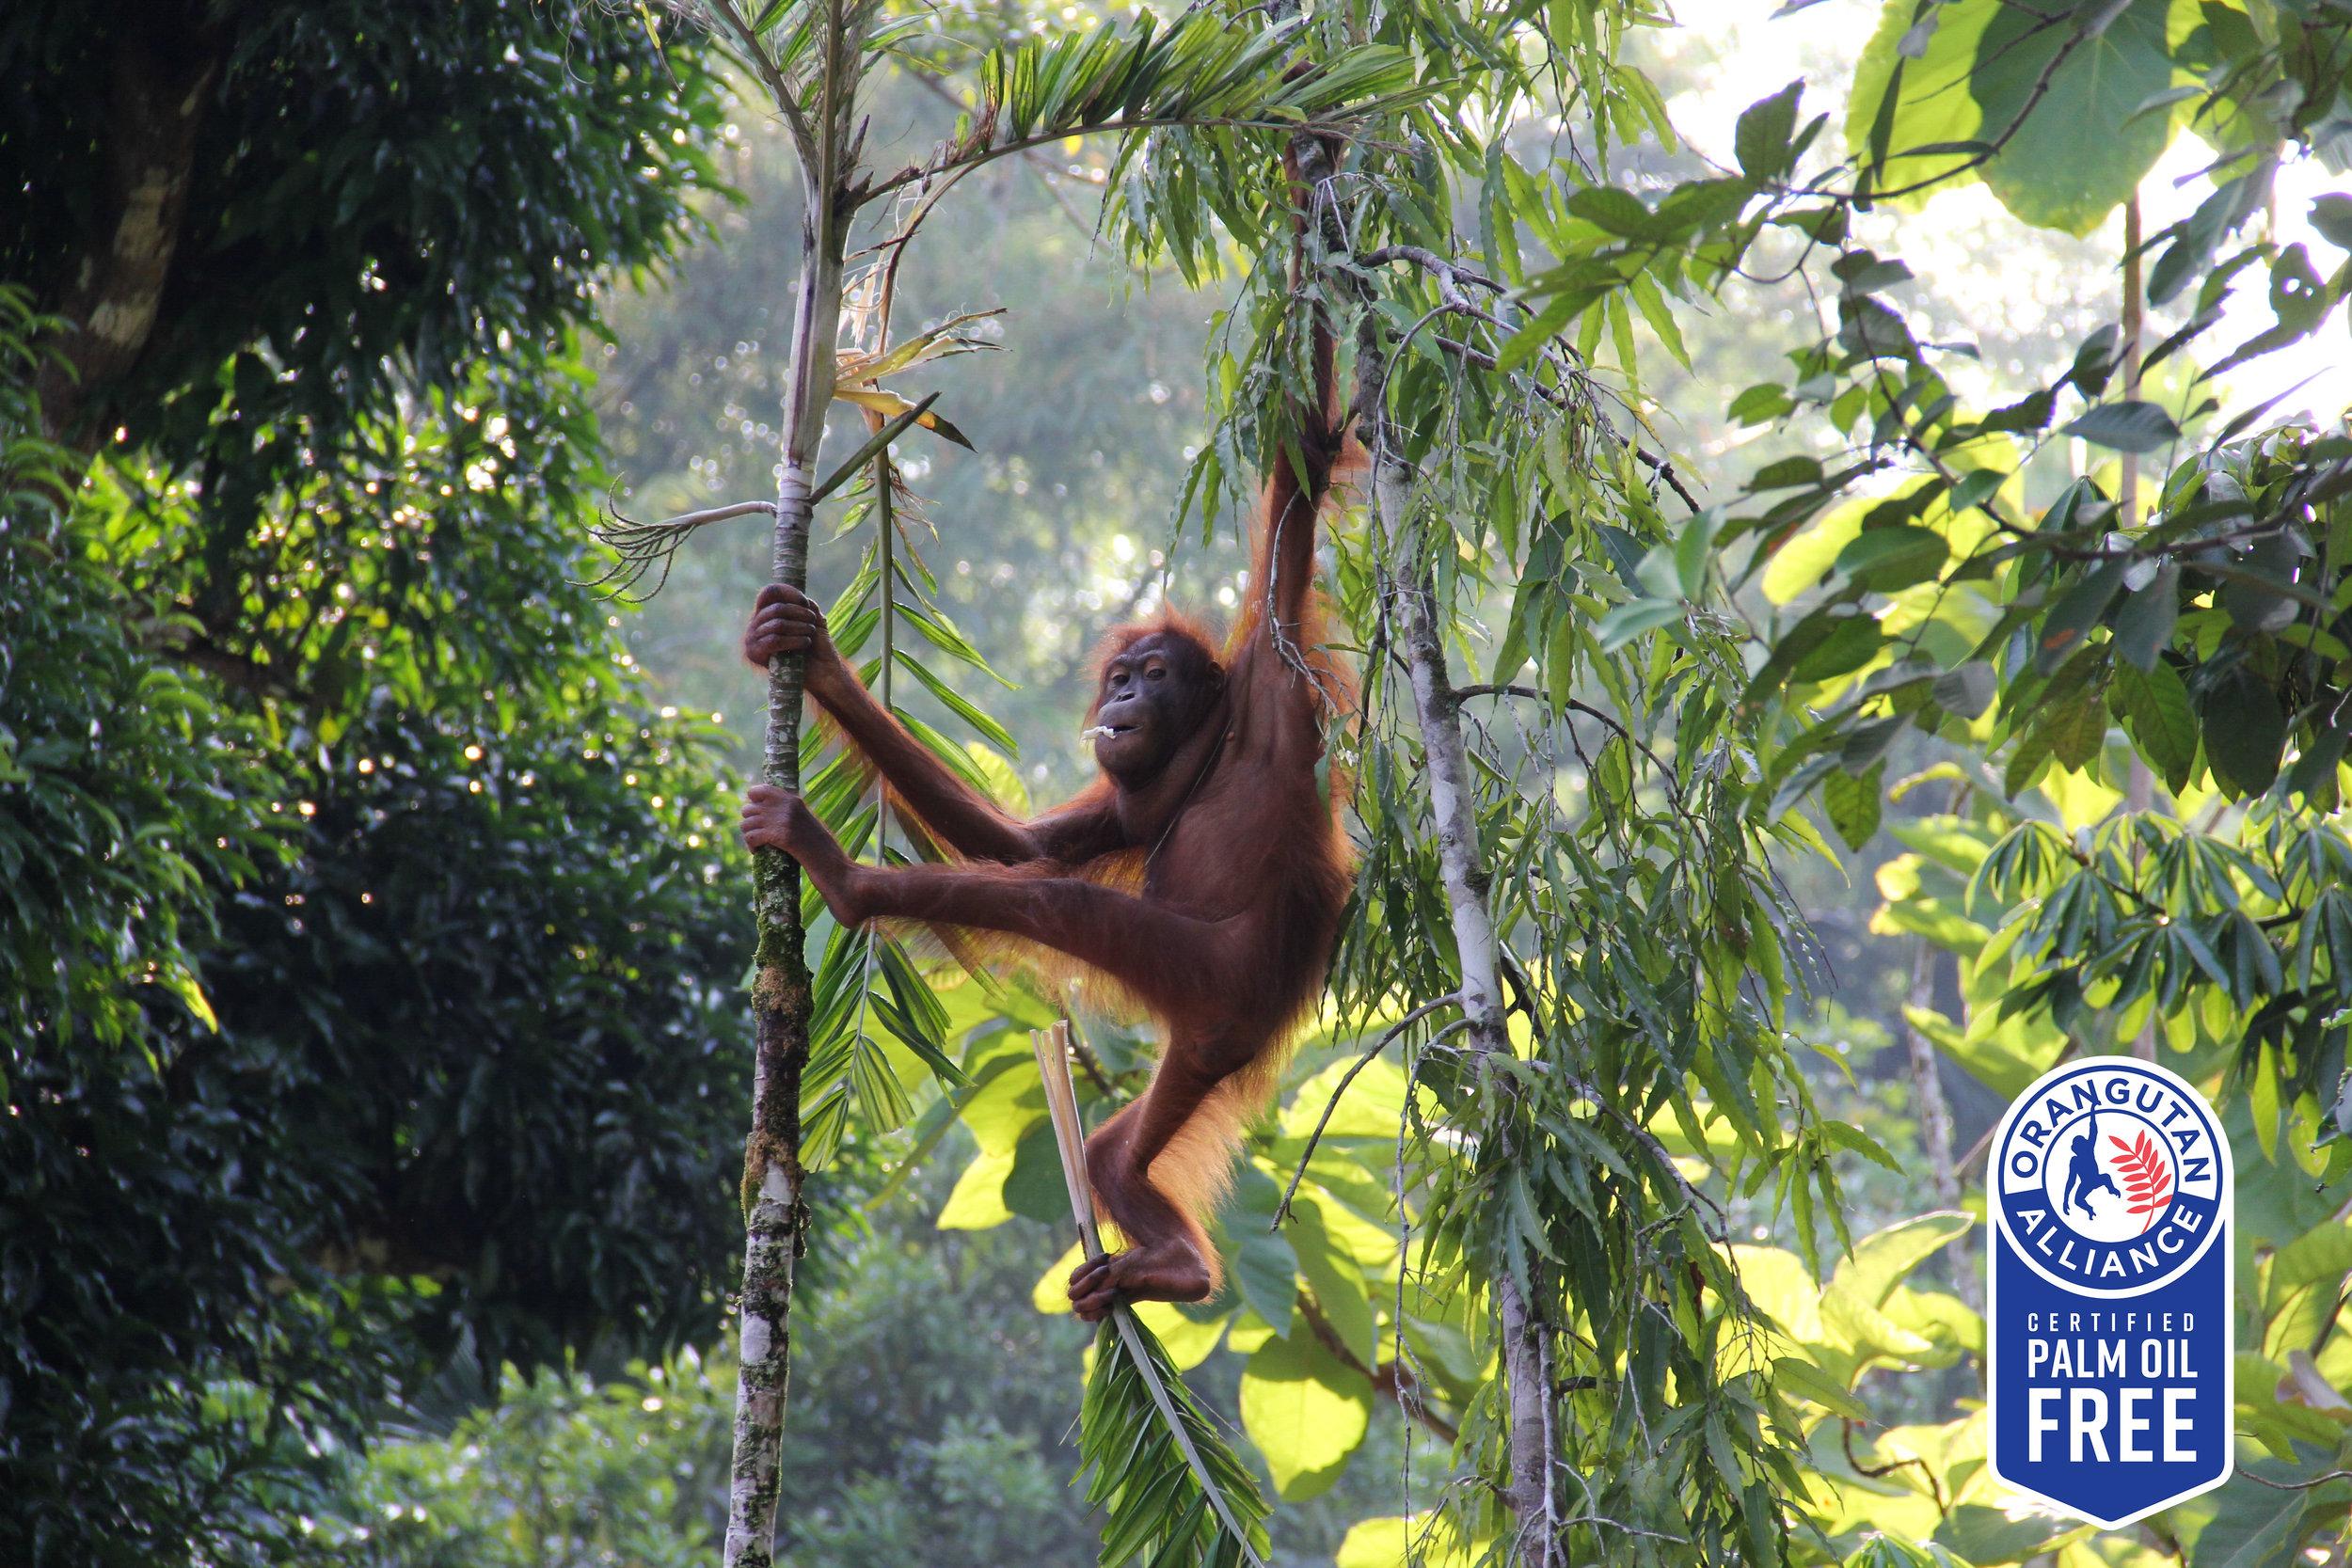 Orangutan_shutterstock_310524923 copy.jpg